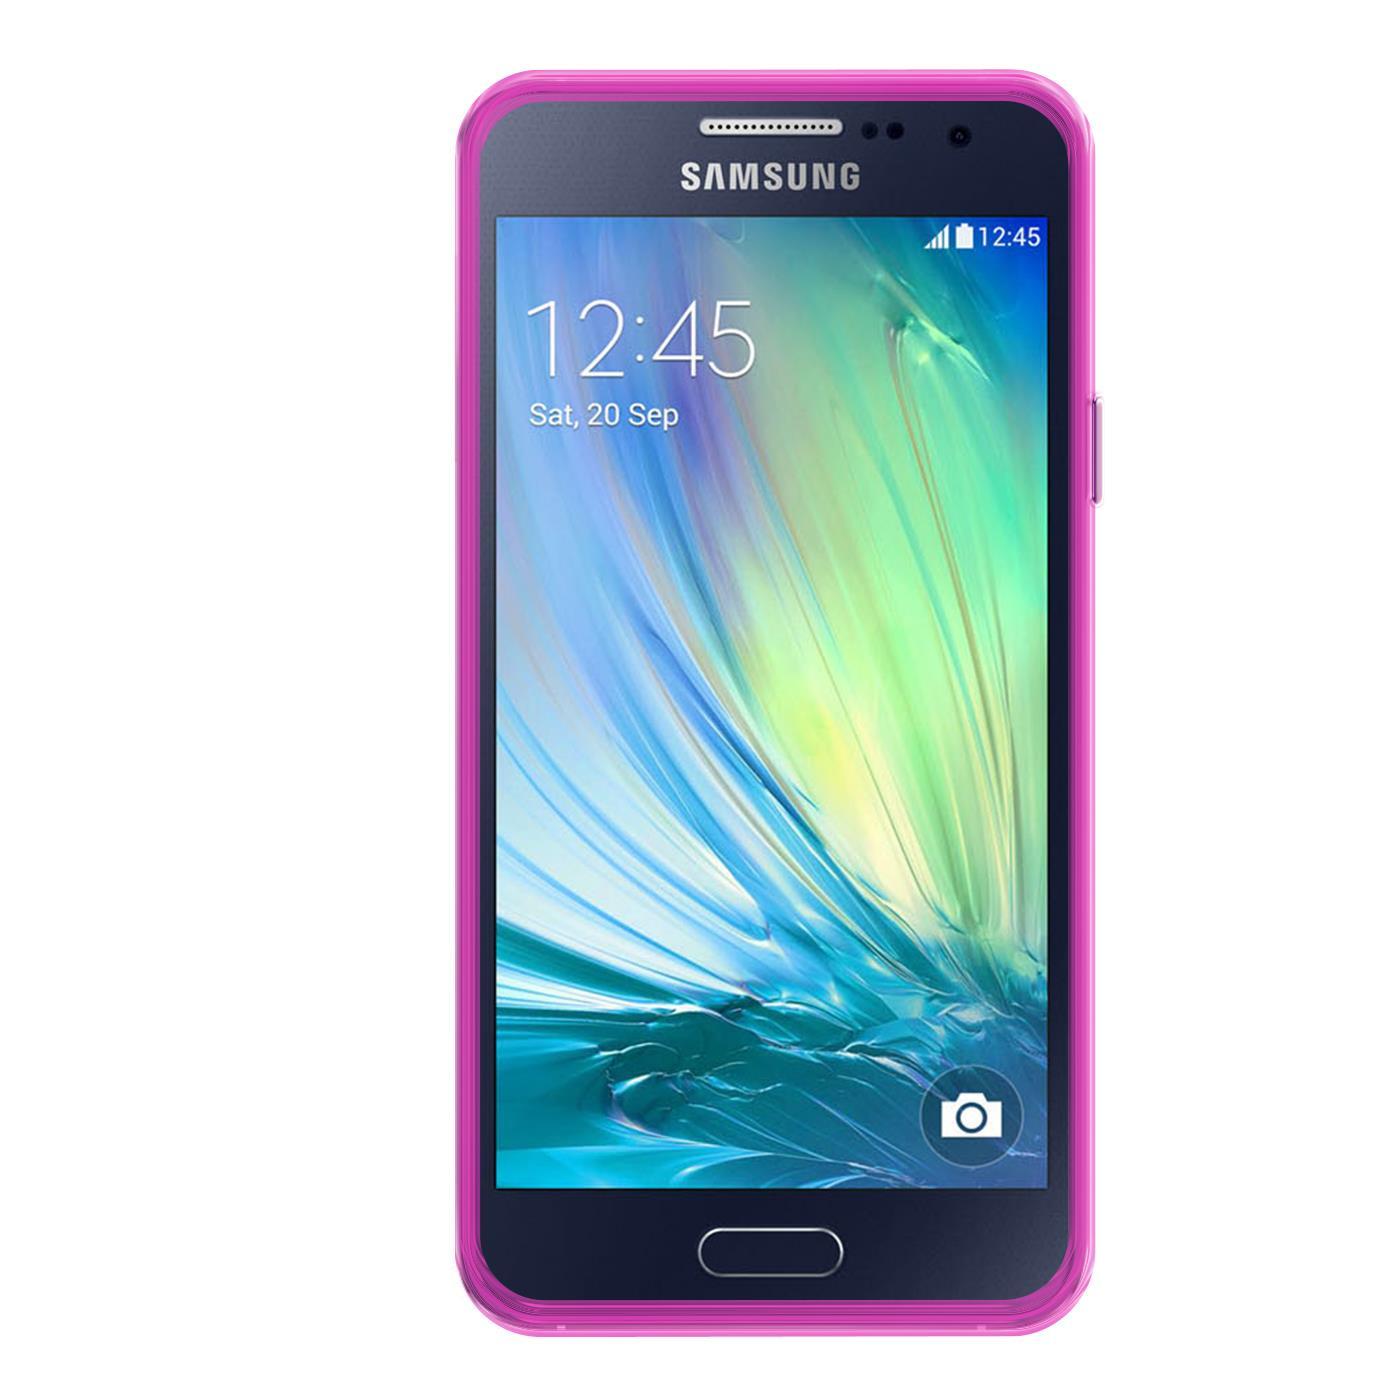 Samsung-Galaxy-A3-2015-Thin-Silicone-Clear-Case-Cover-Ultra-Slim-Shockproof-Gel Indexbild 23